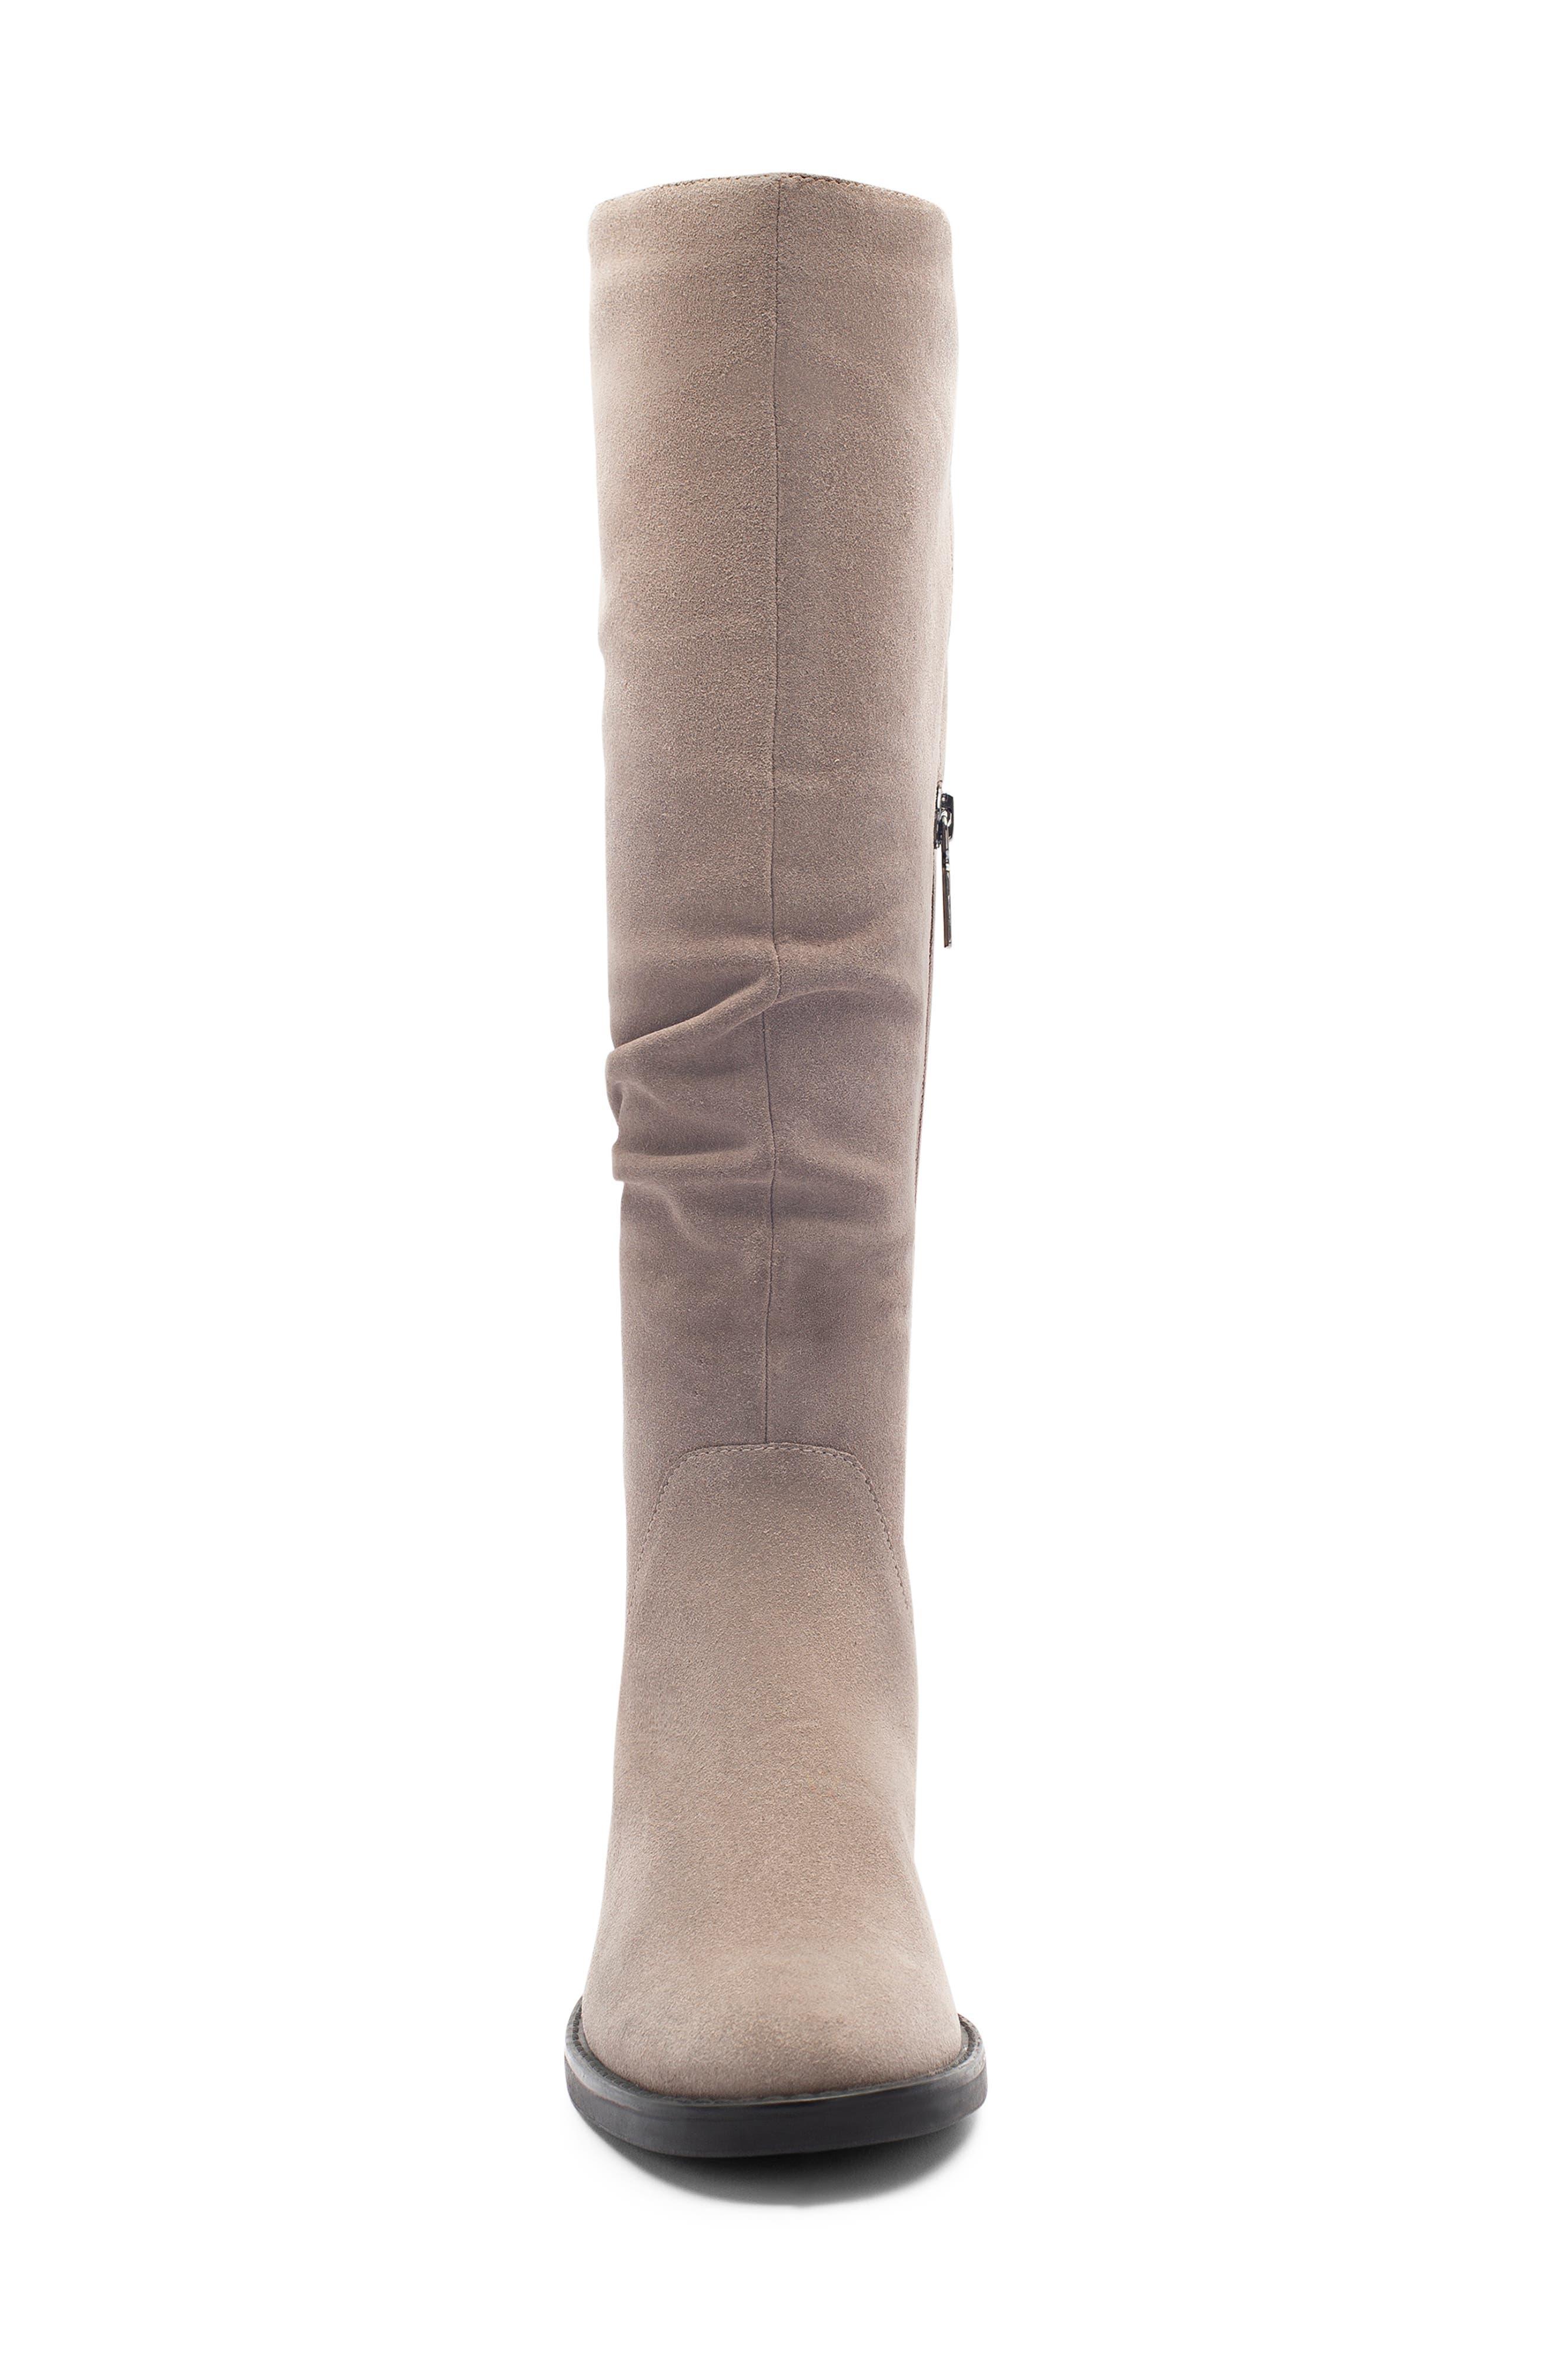 Erika Waterproof Knee High Boot,                             Alternate thumbnail 4, color,                             DARK TAUPE SUEDE